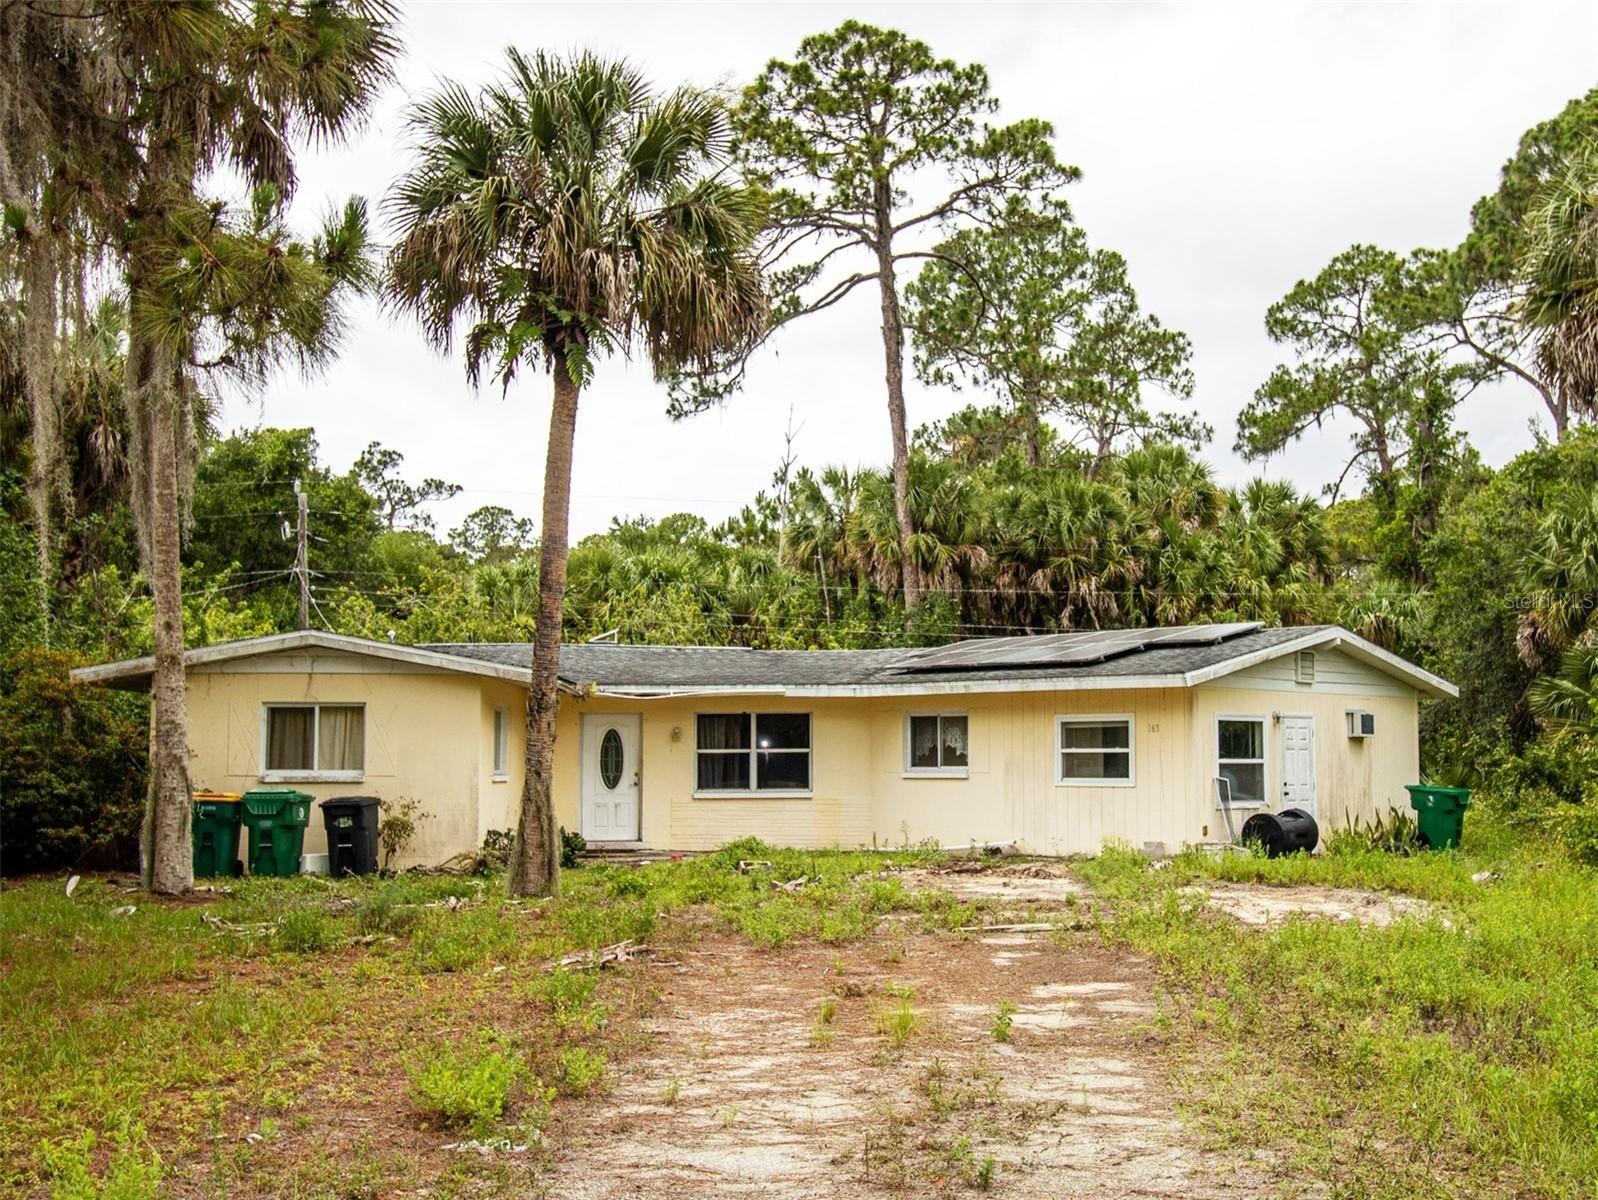 Photo of 163 COLLINGSWOOD BOULEVARD, PORT CHARLOTTE, FL 33954 (MLS # D6119412)